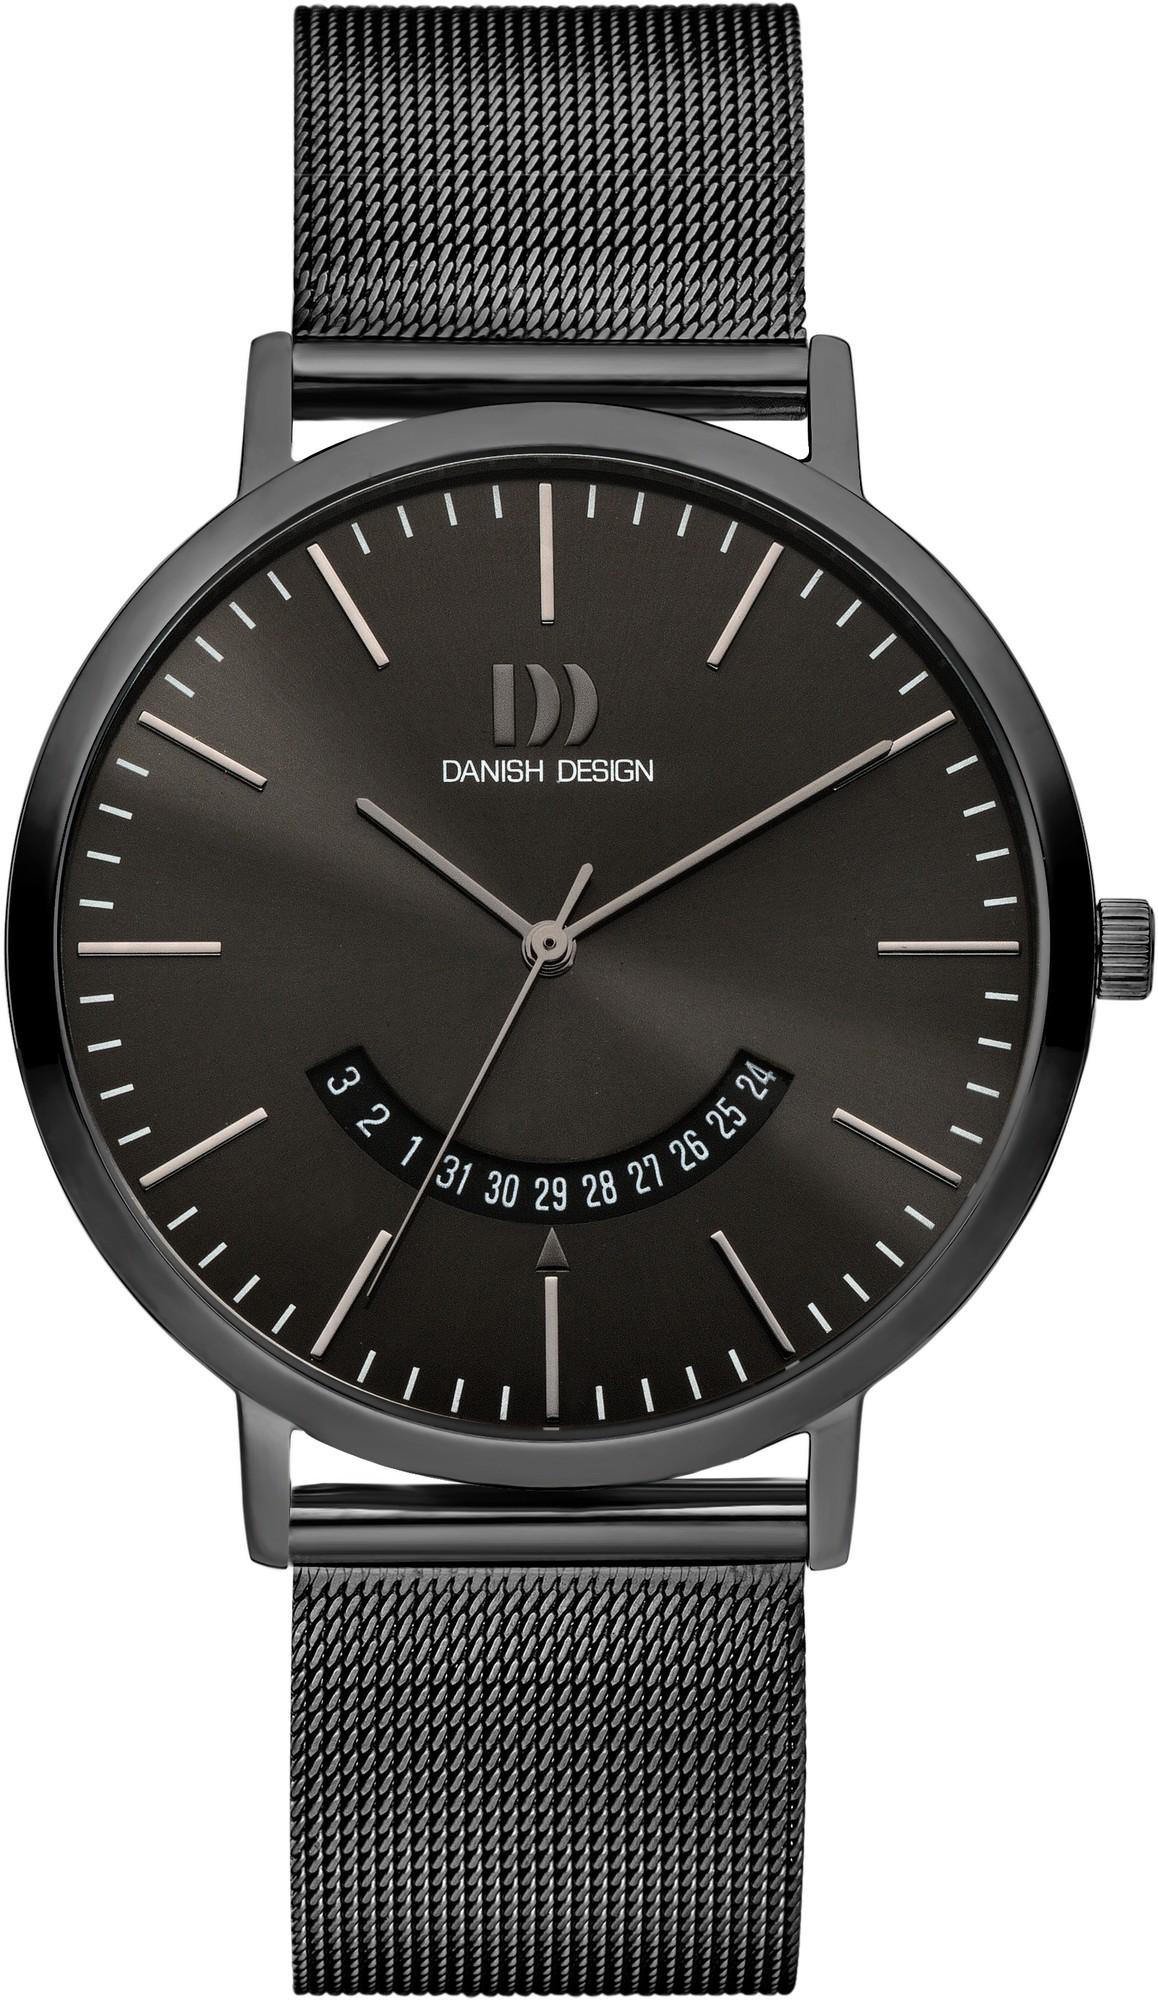 Danish Design IQ66Q1239